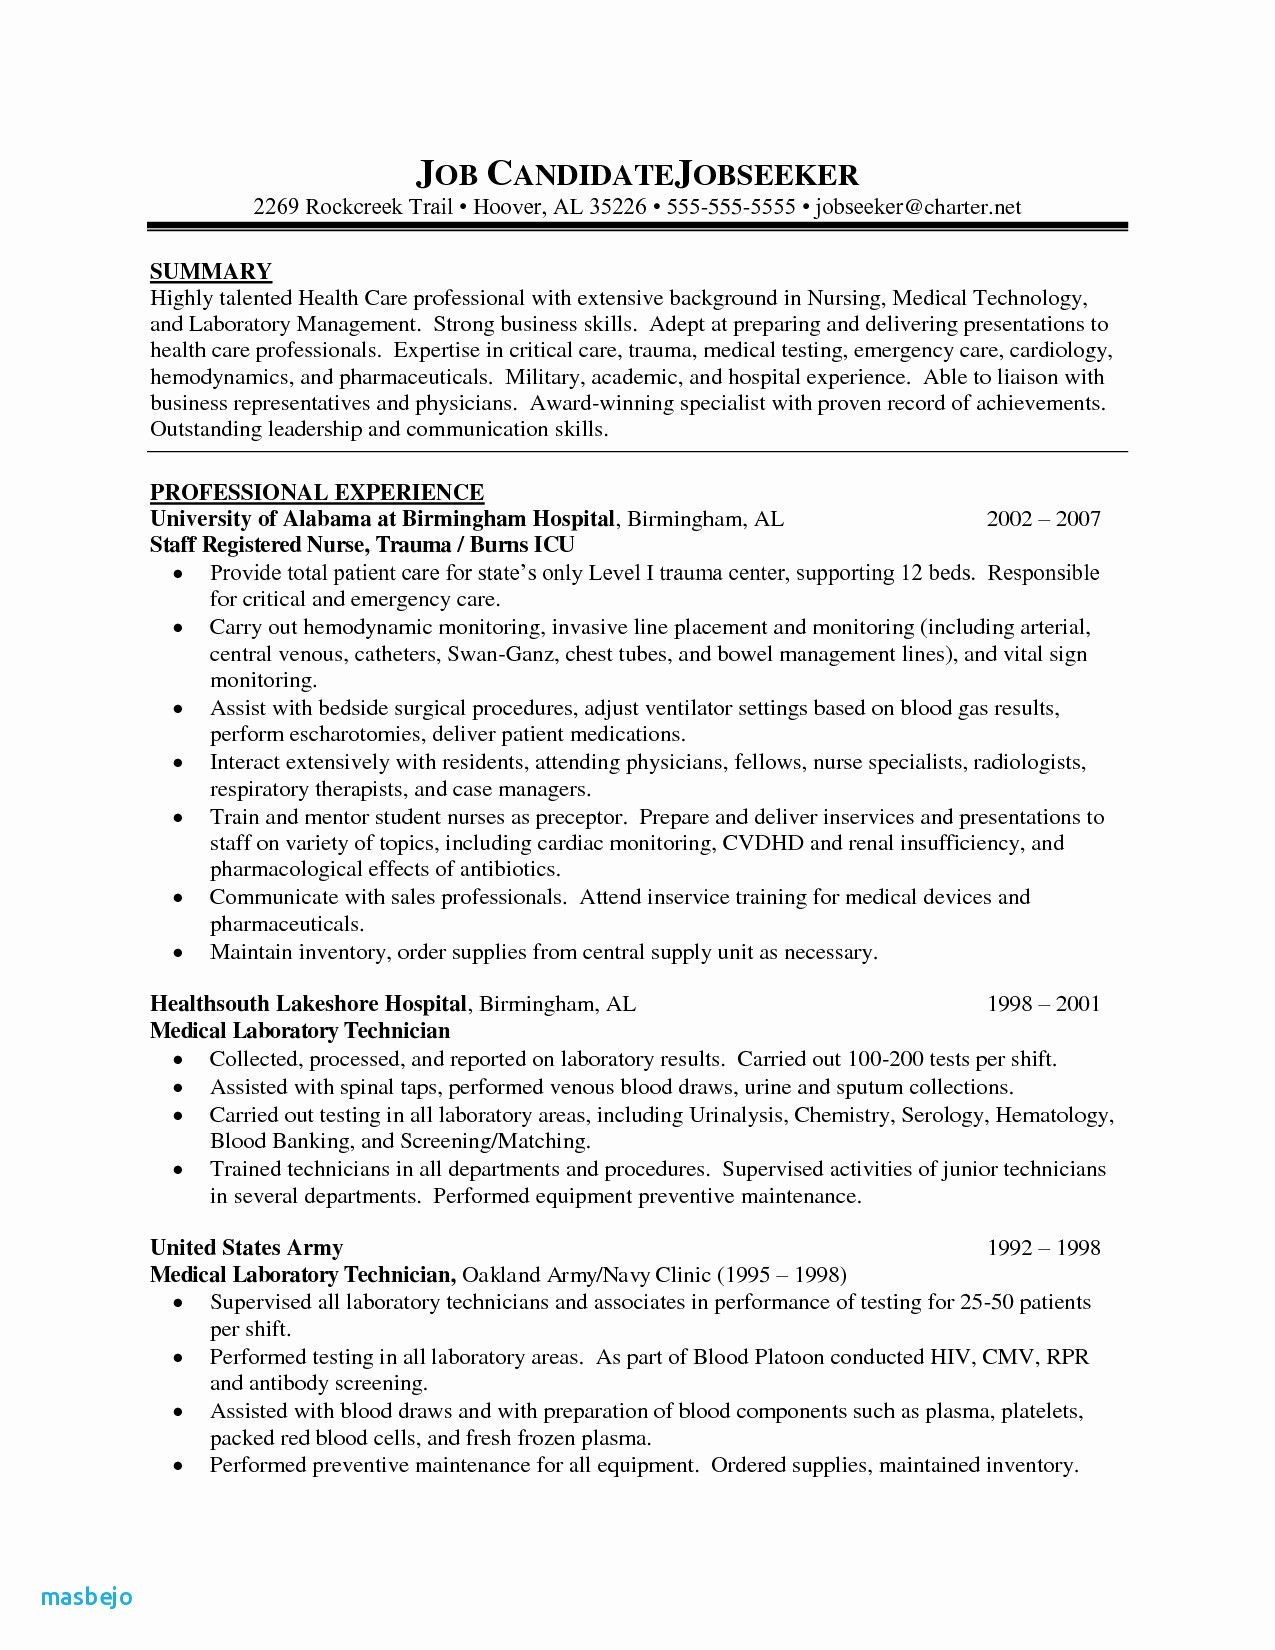 Pin by Joanna Keysa on Free Tamplate Nursing resume